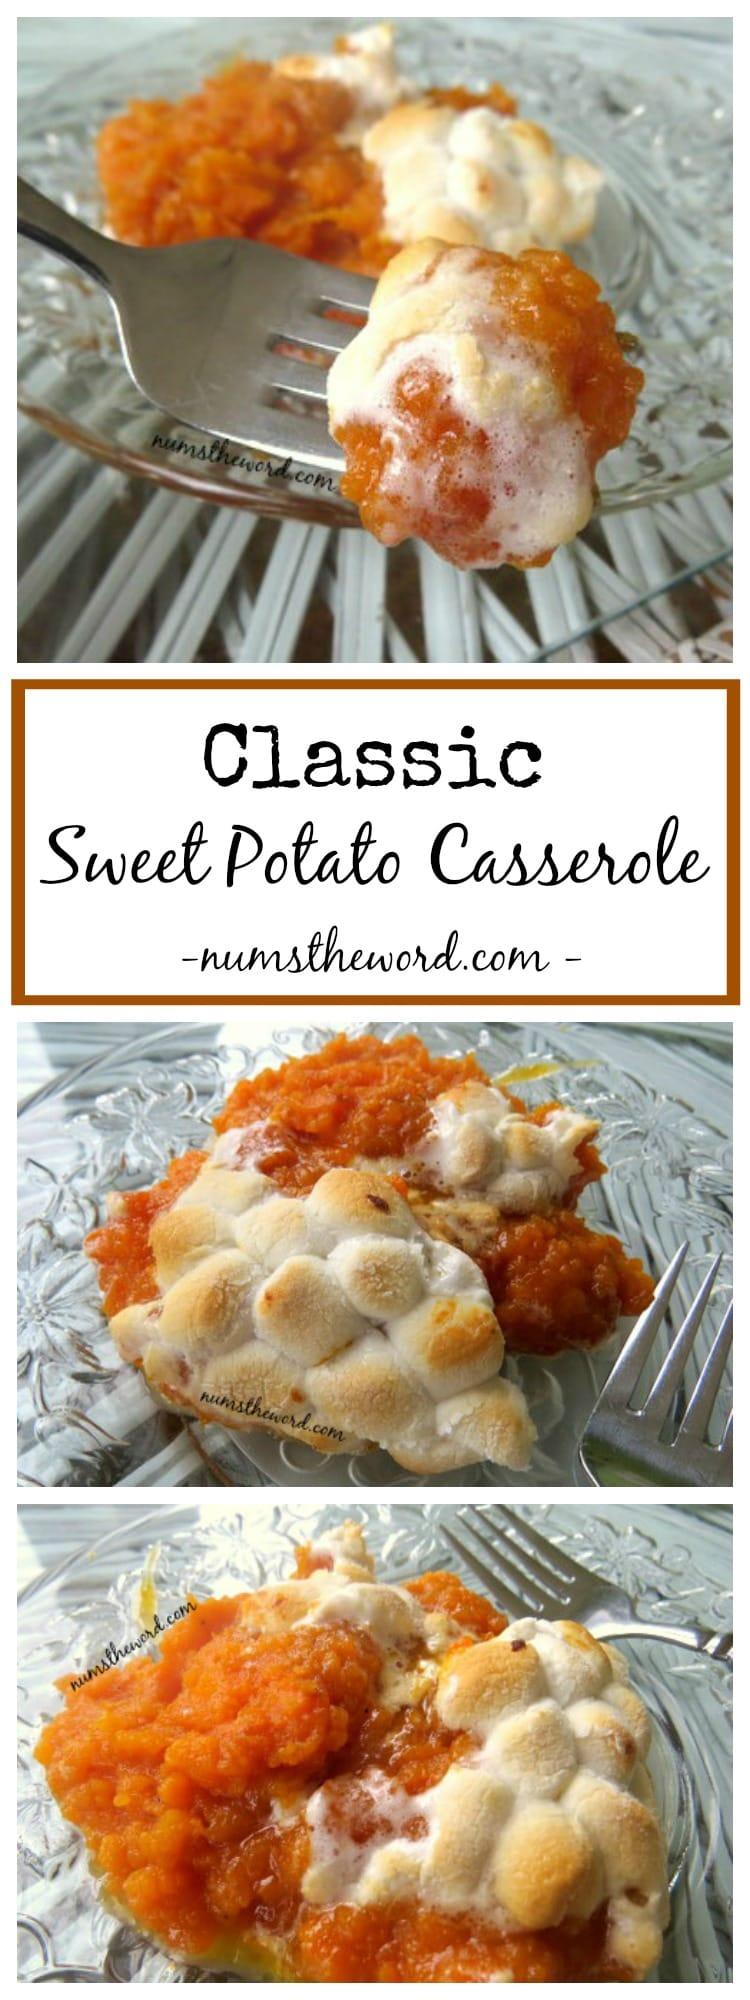 Classic Sweet Potato Casserole - NumsTheWord